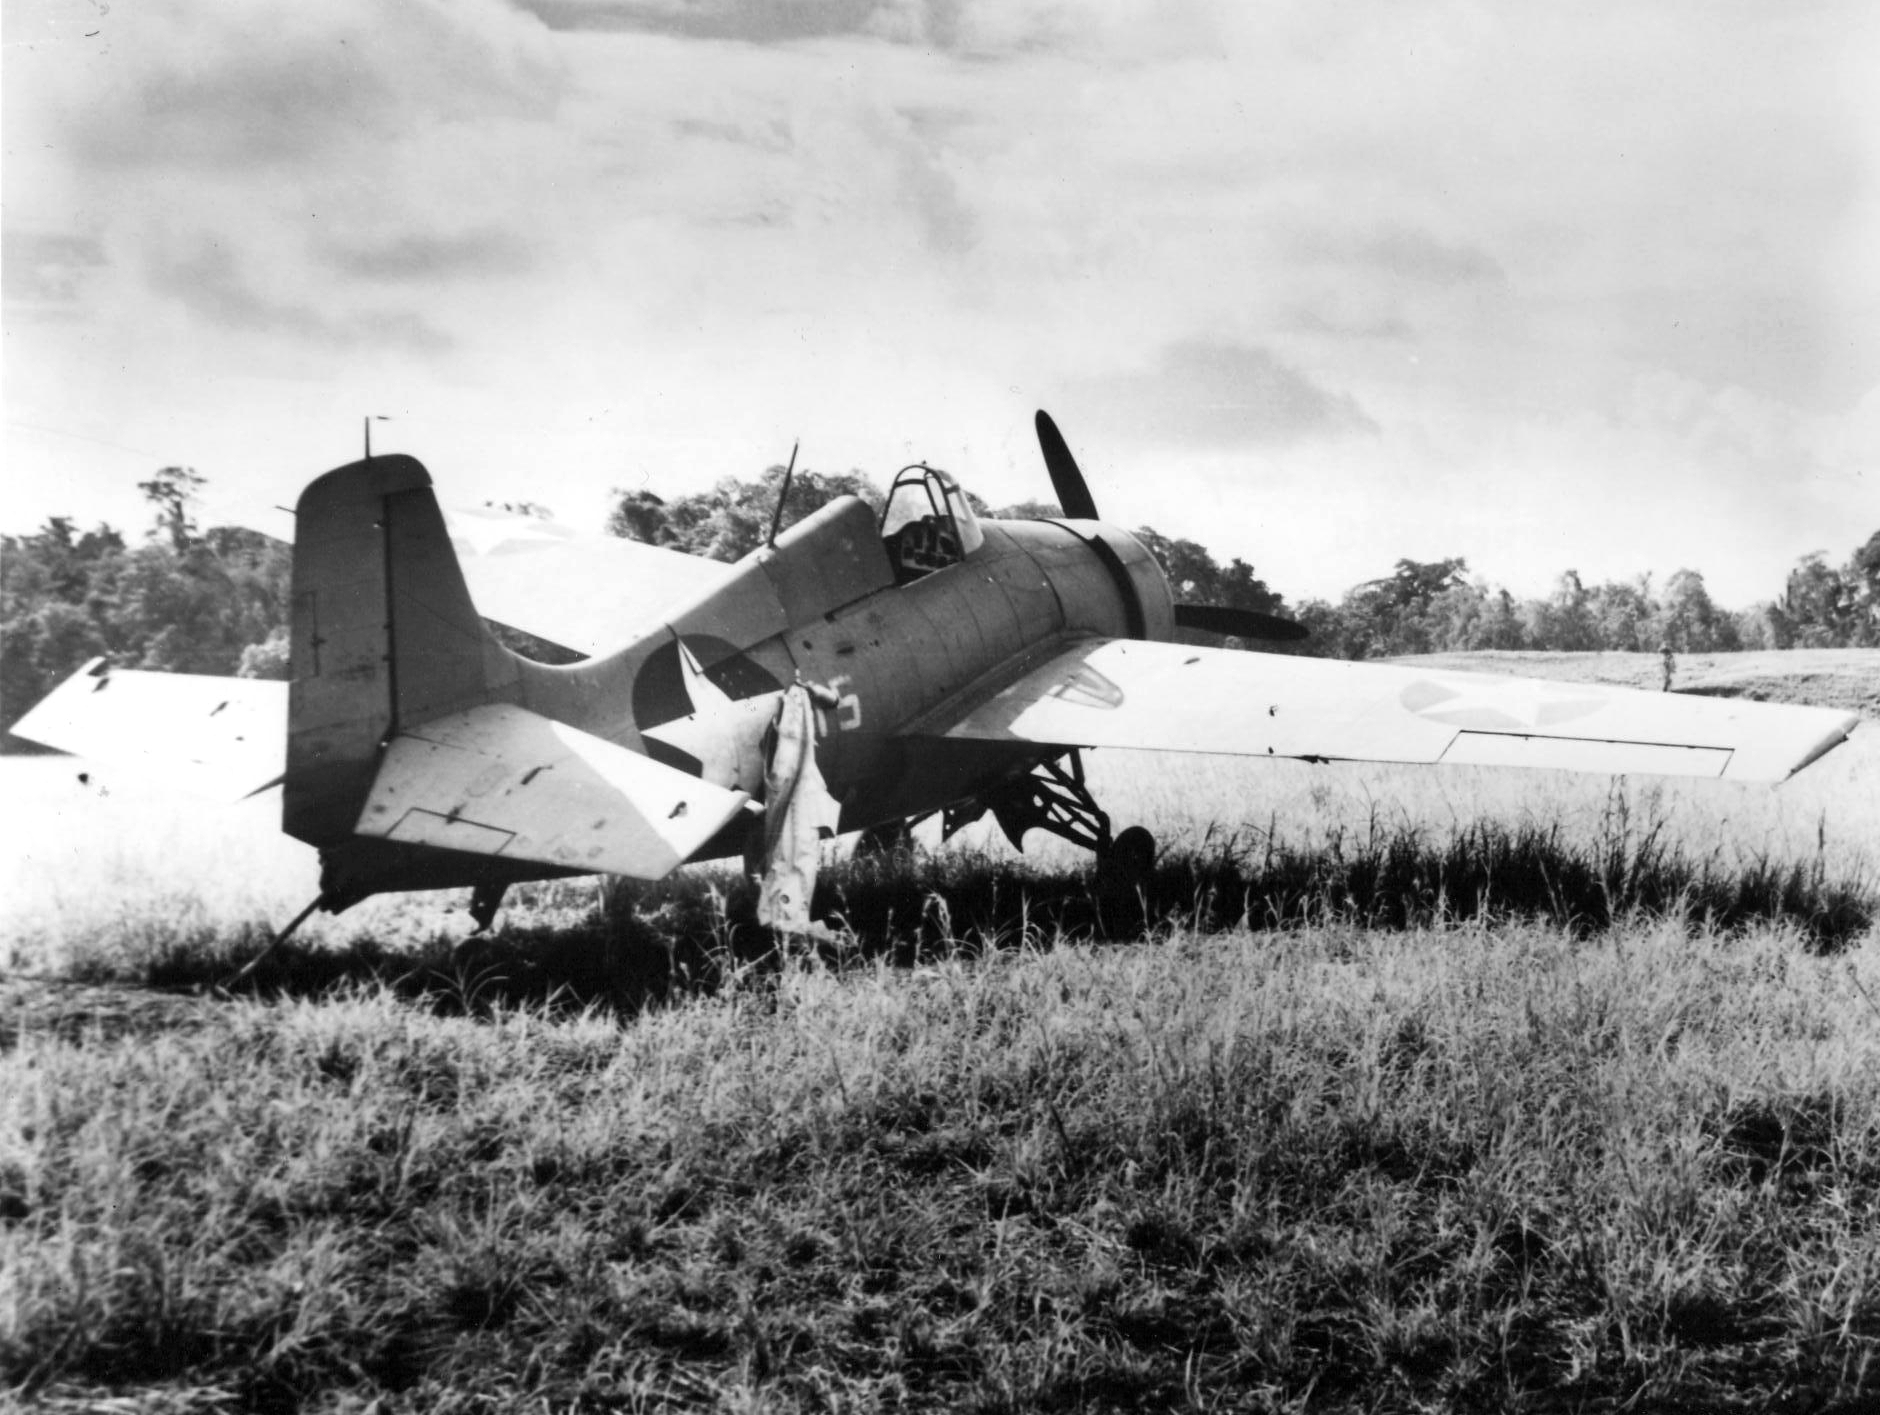 Grumman F4F 3 Wildcat with undercarriage problem Henderson Field Guadalcanal 1942 01